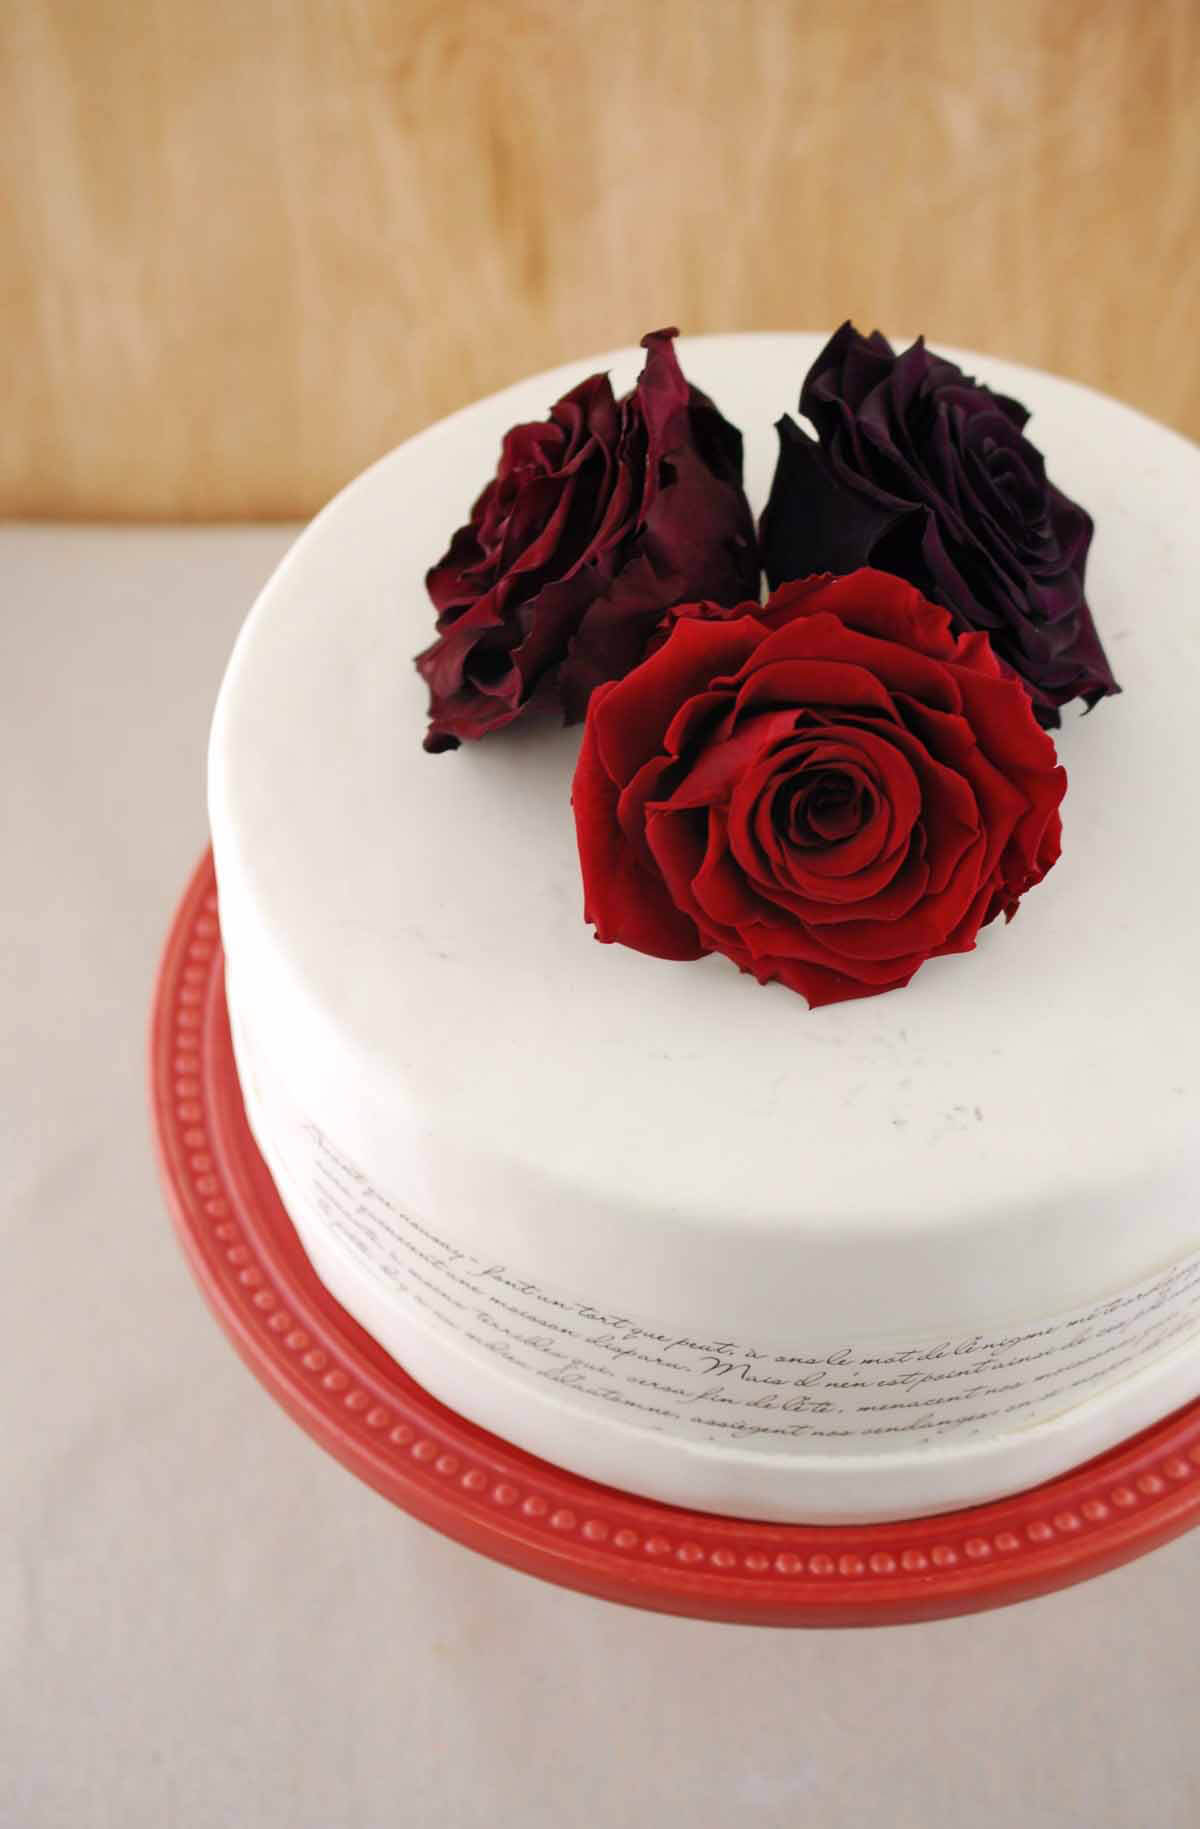 "Preserved Roses 4"" Burgundy Red"